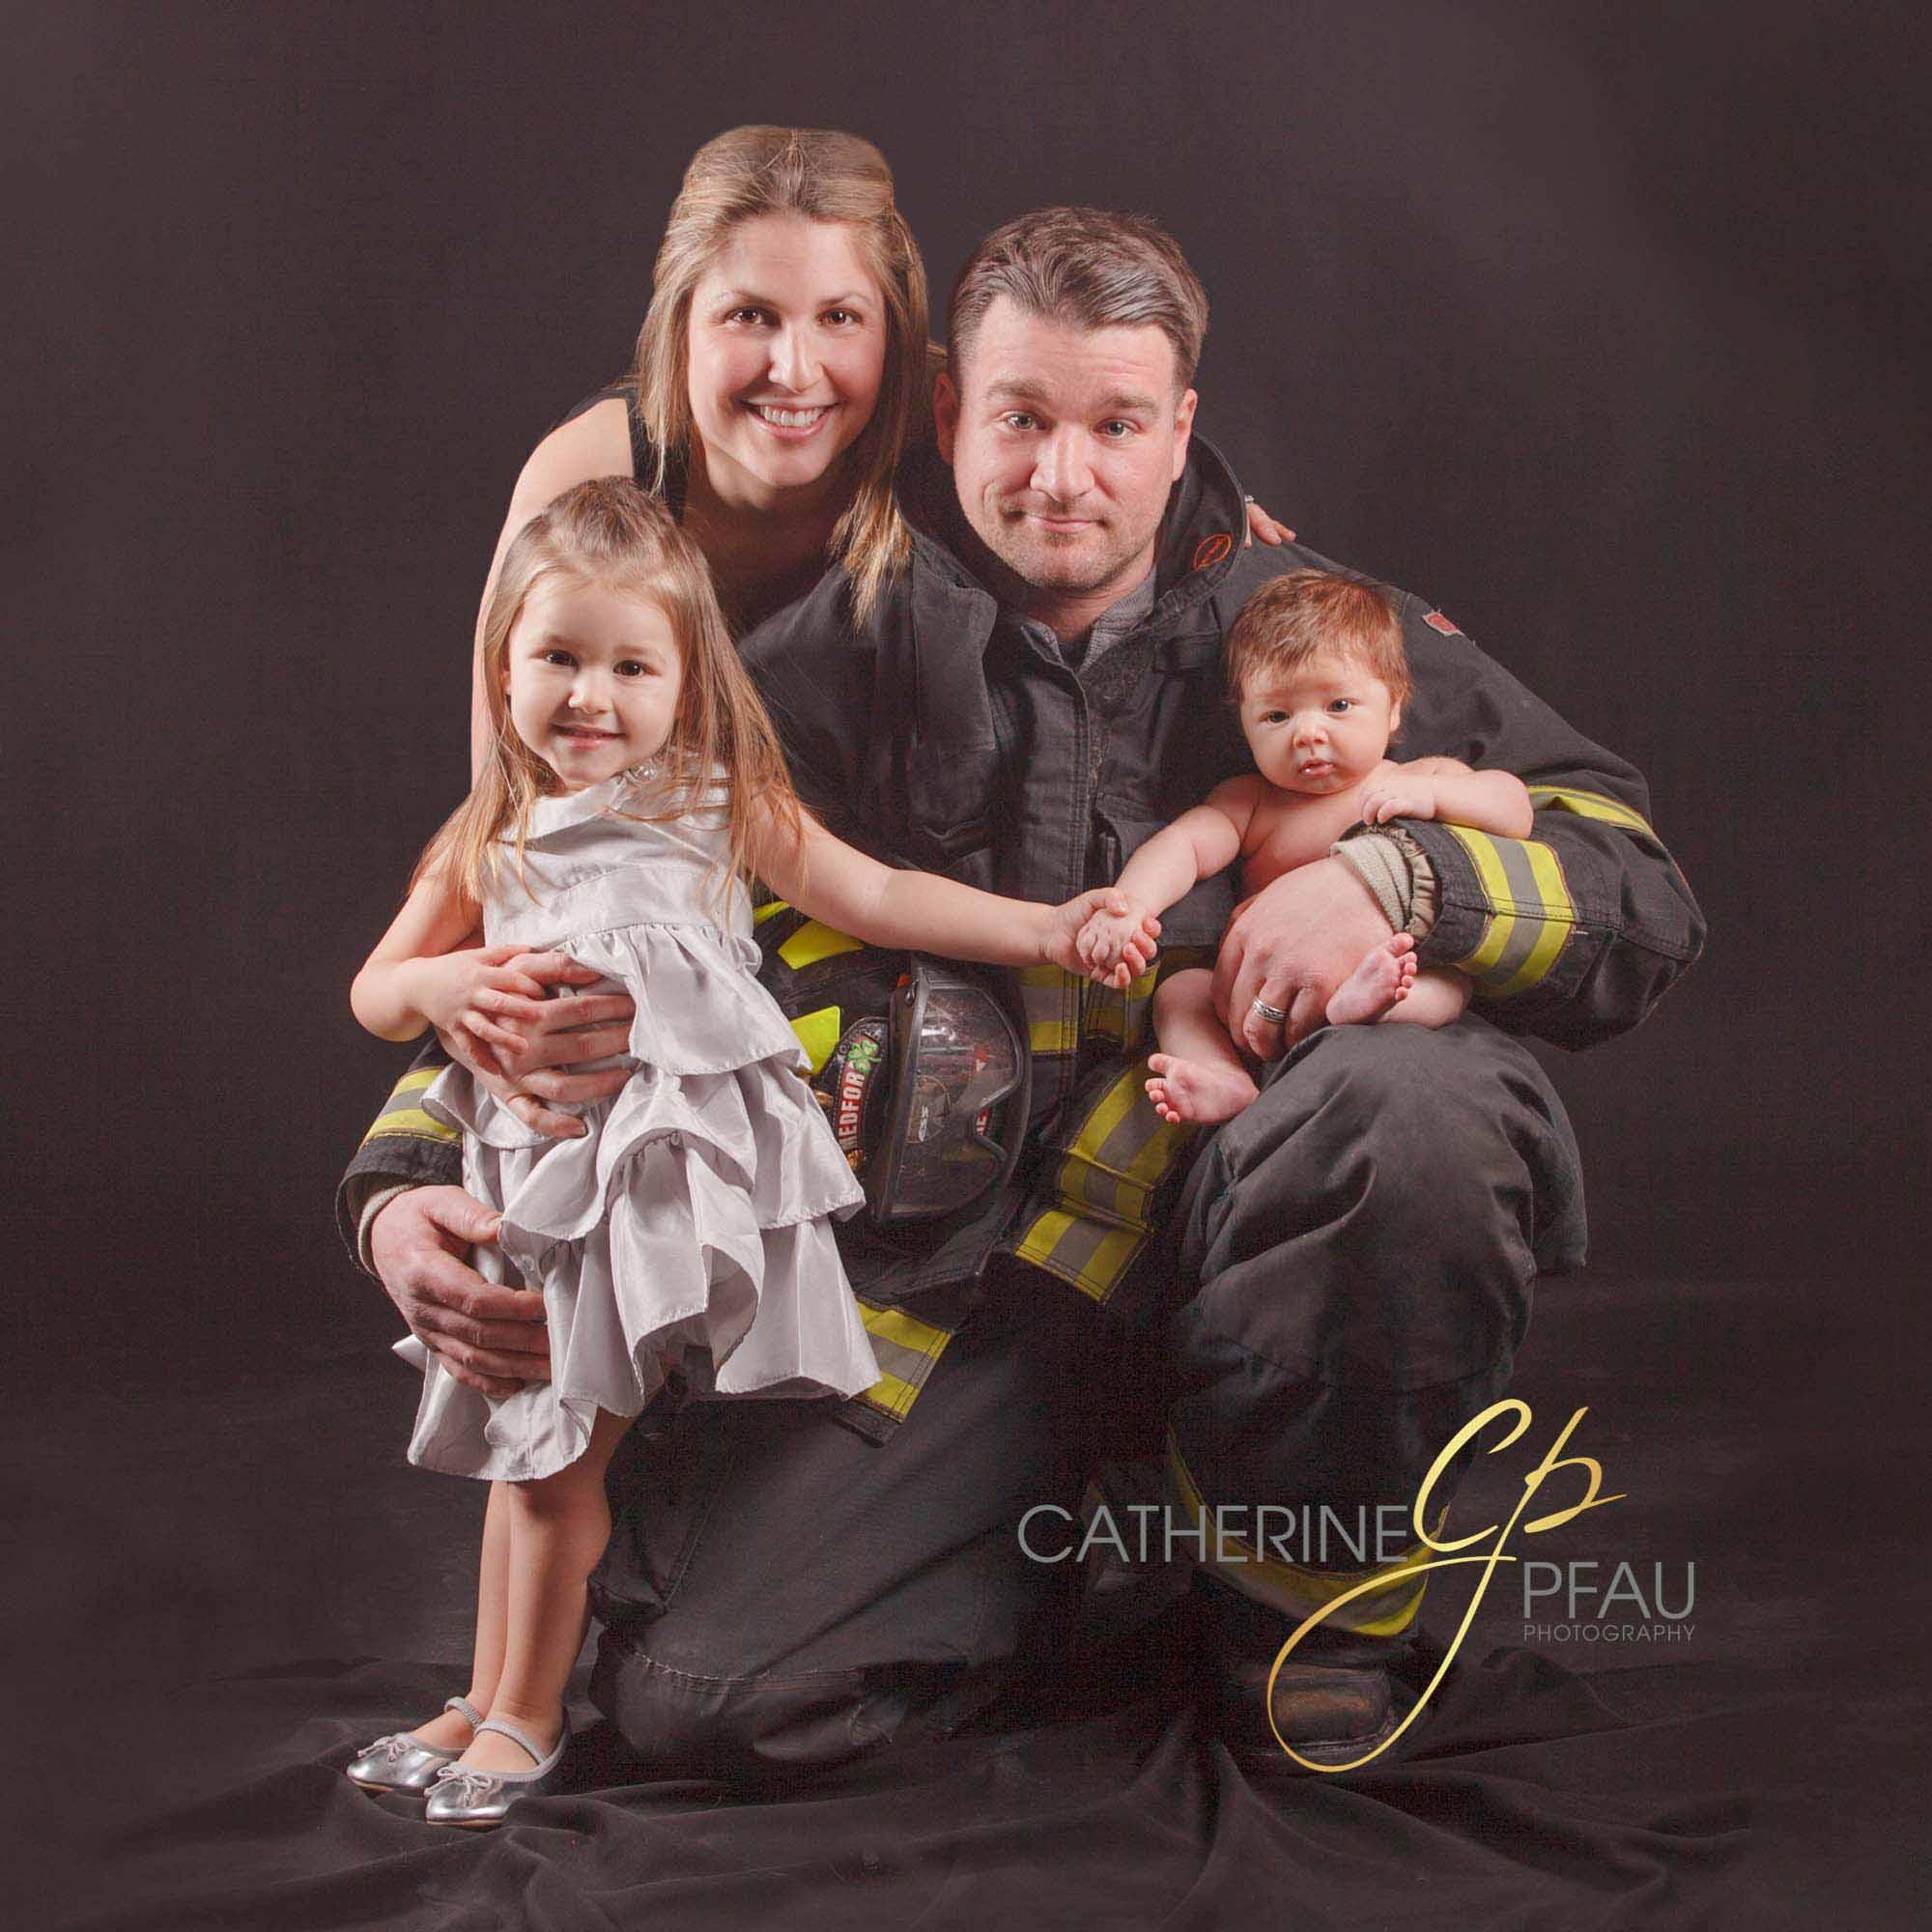 catherinepfauphotography_familyportrait_children_photography-2.jpg